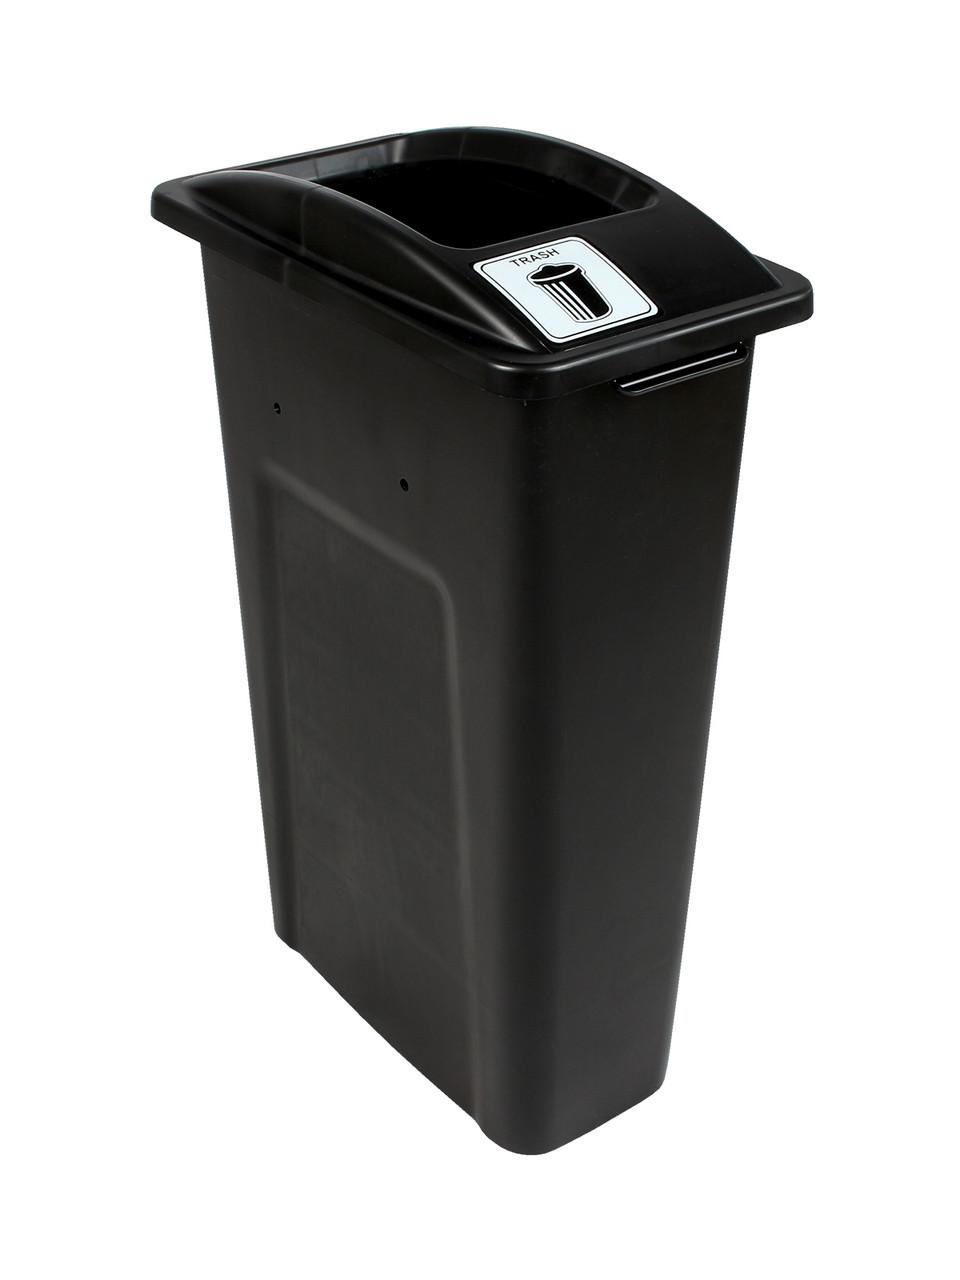 23 Gallon Black Skinny Simple Sort Trash Can (Trash, Open Top)